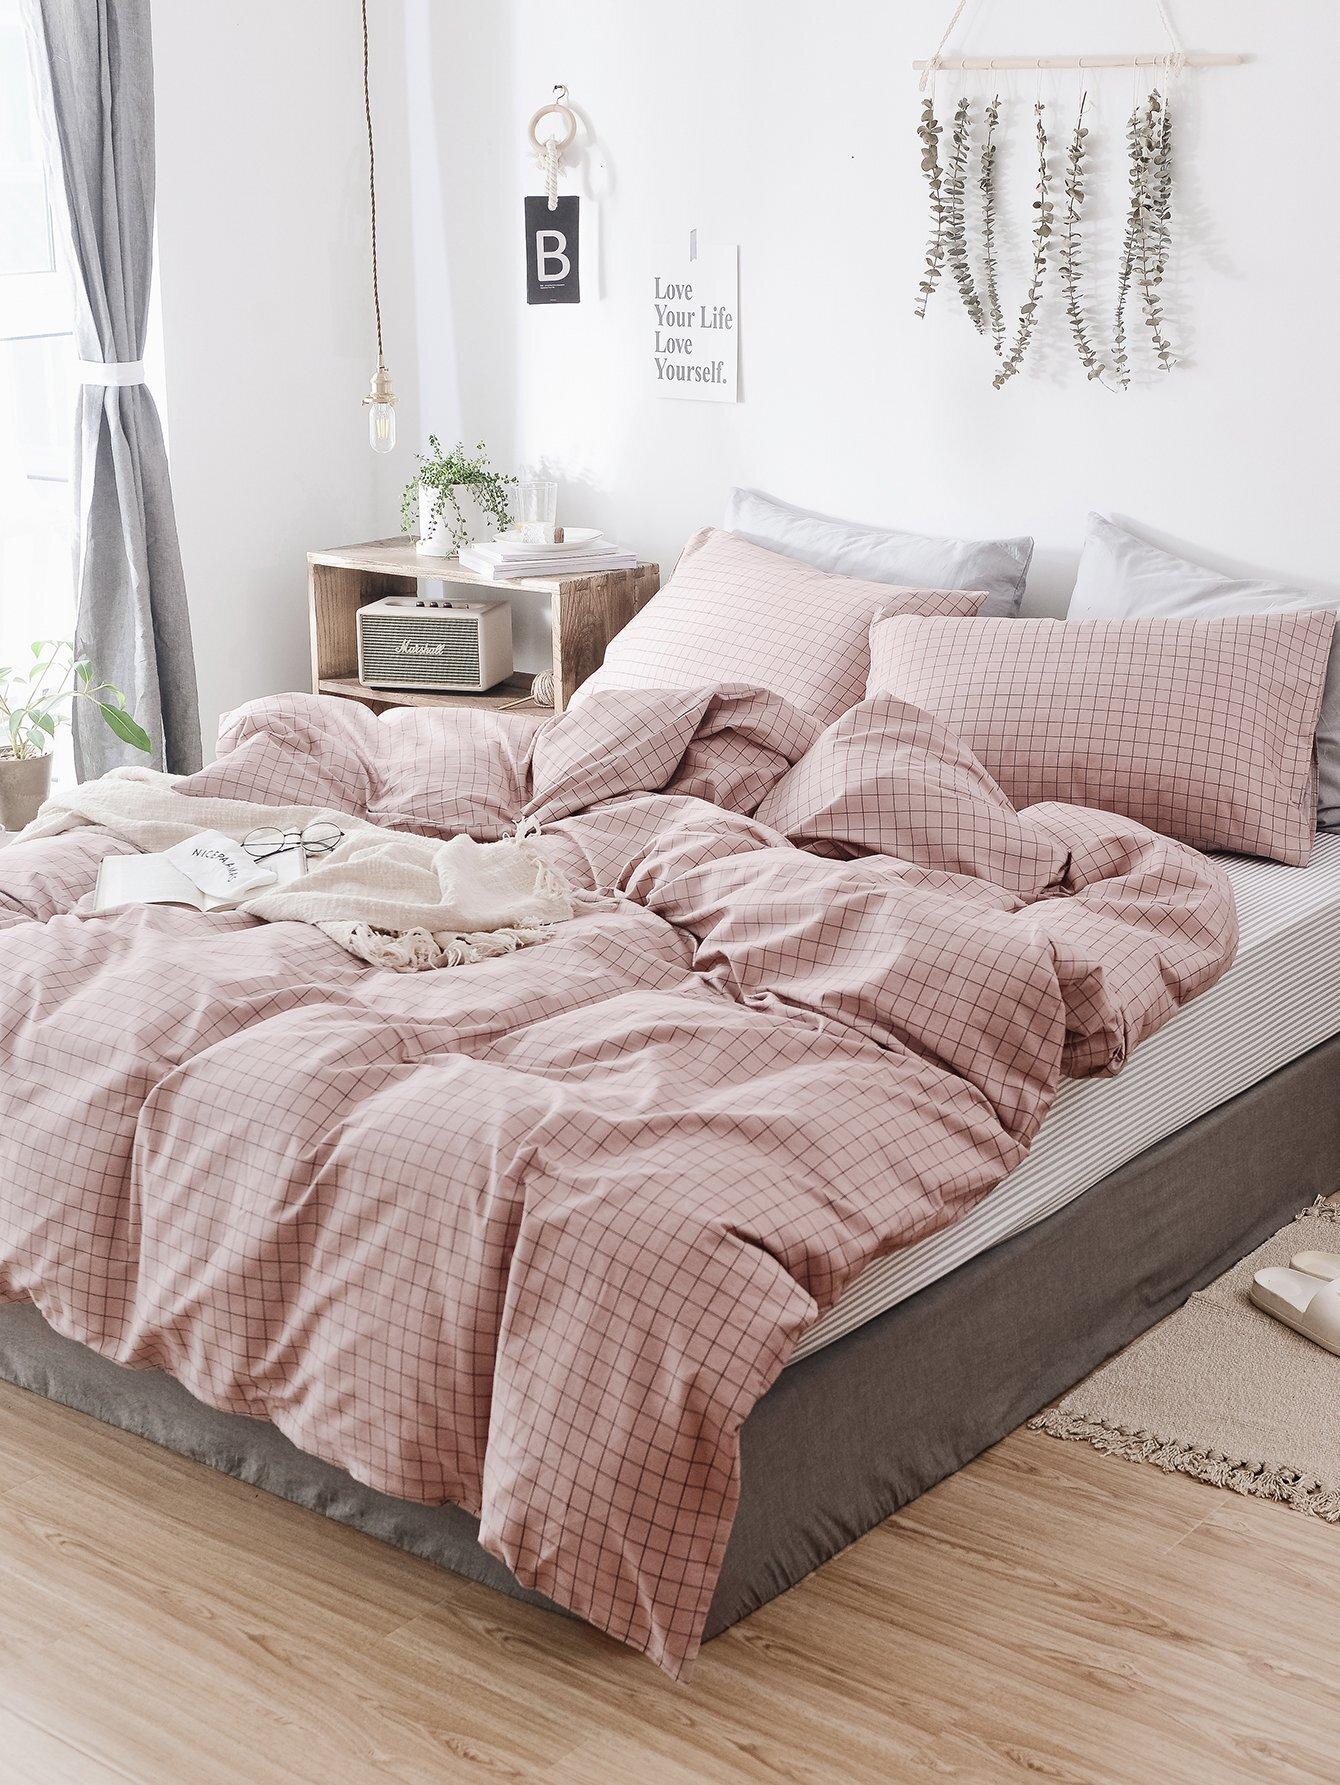 ensemble de draps carreaux french shein sheinside. Black Bedroom Furniture Sets. Home Design Ideas